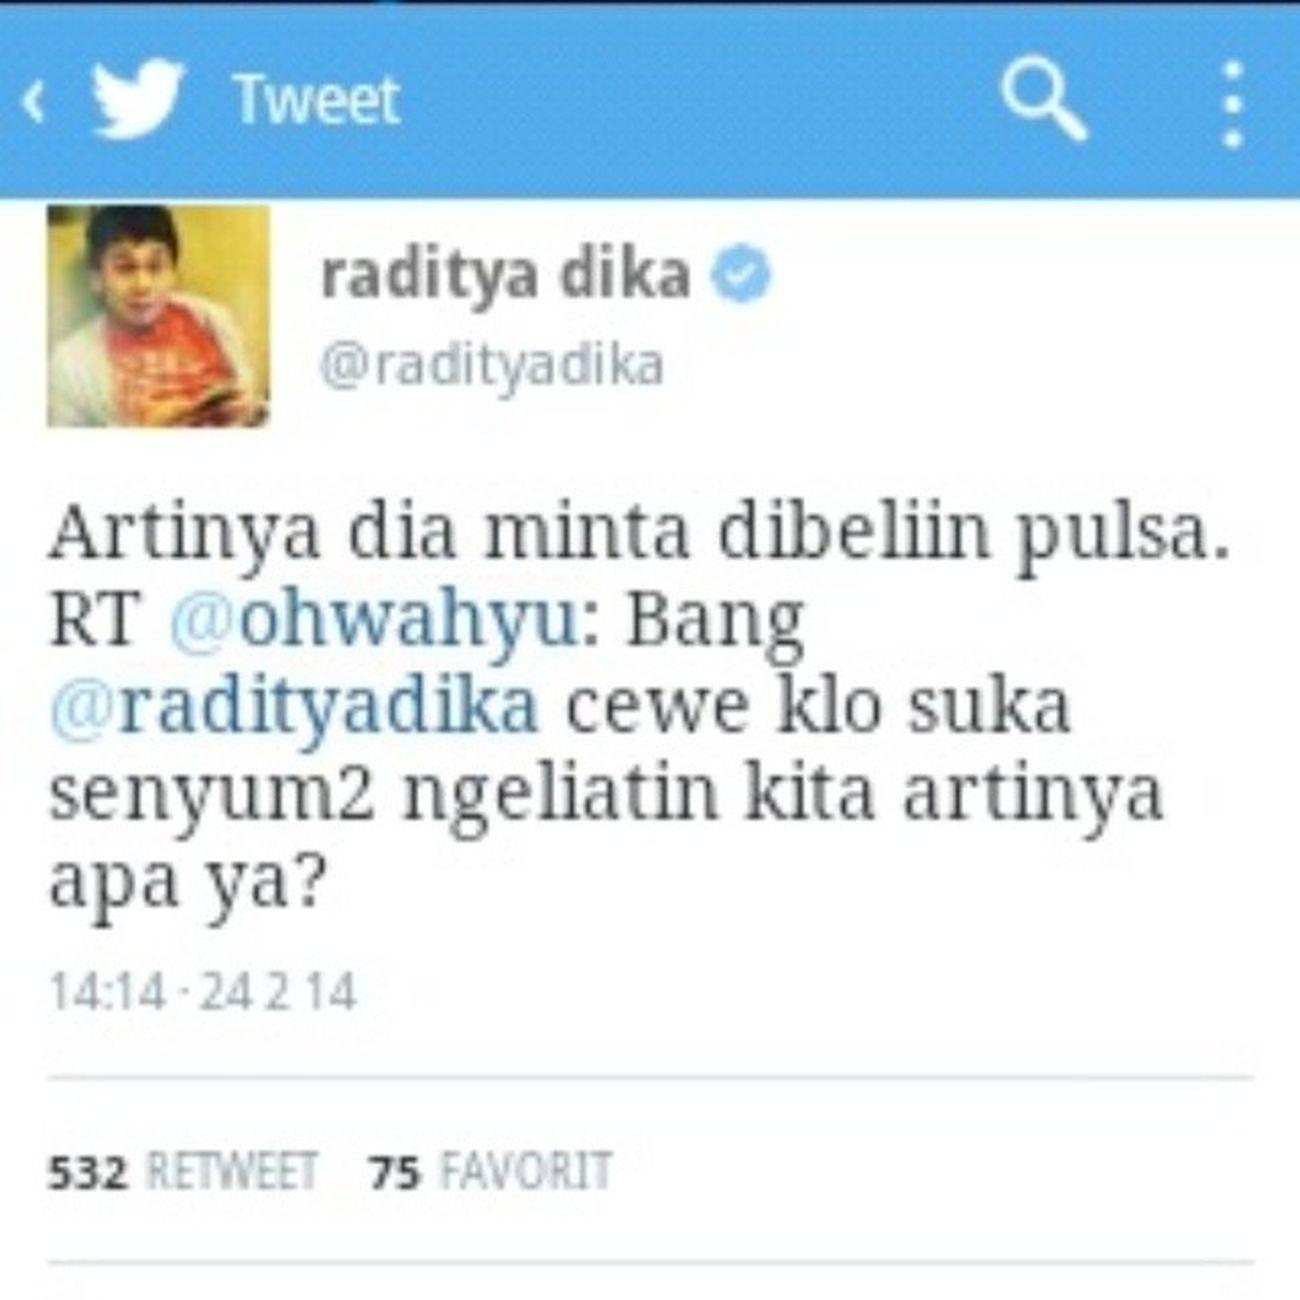 Mention Radityadika